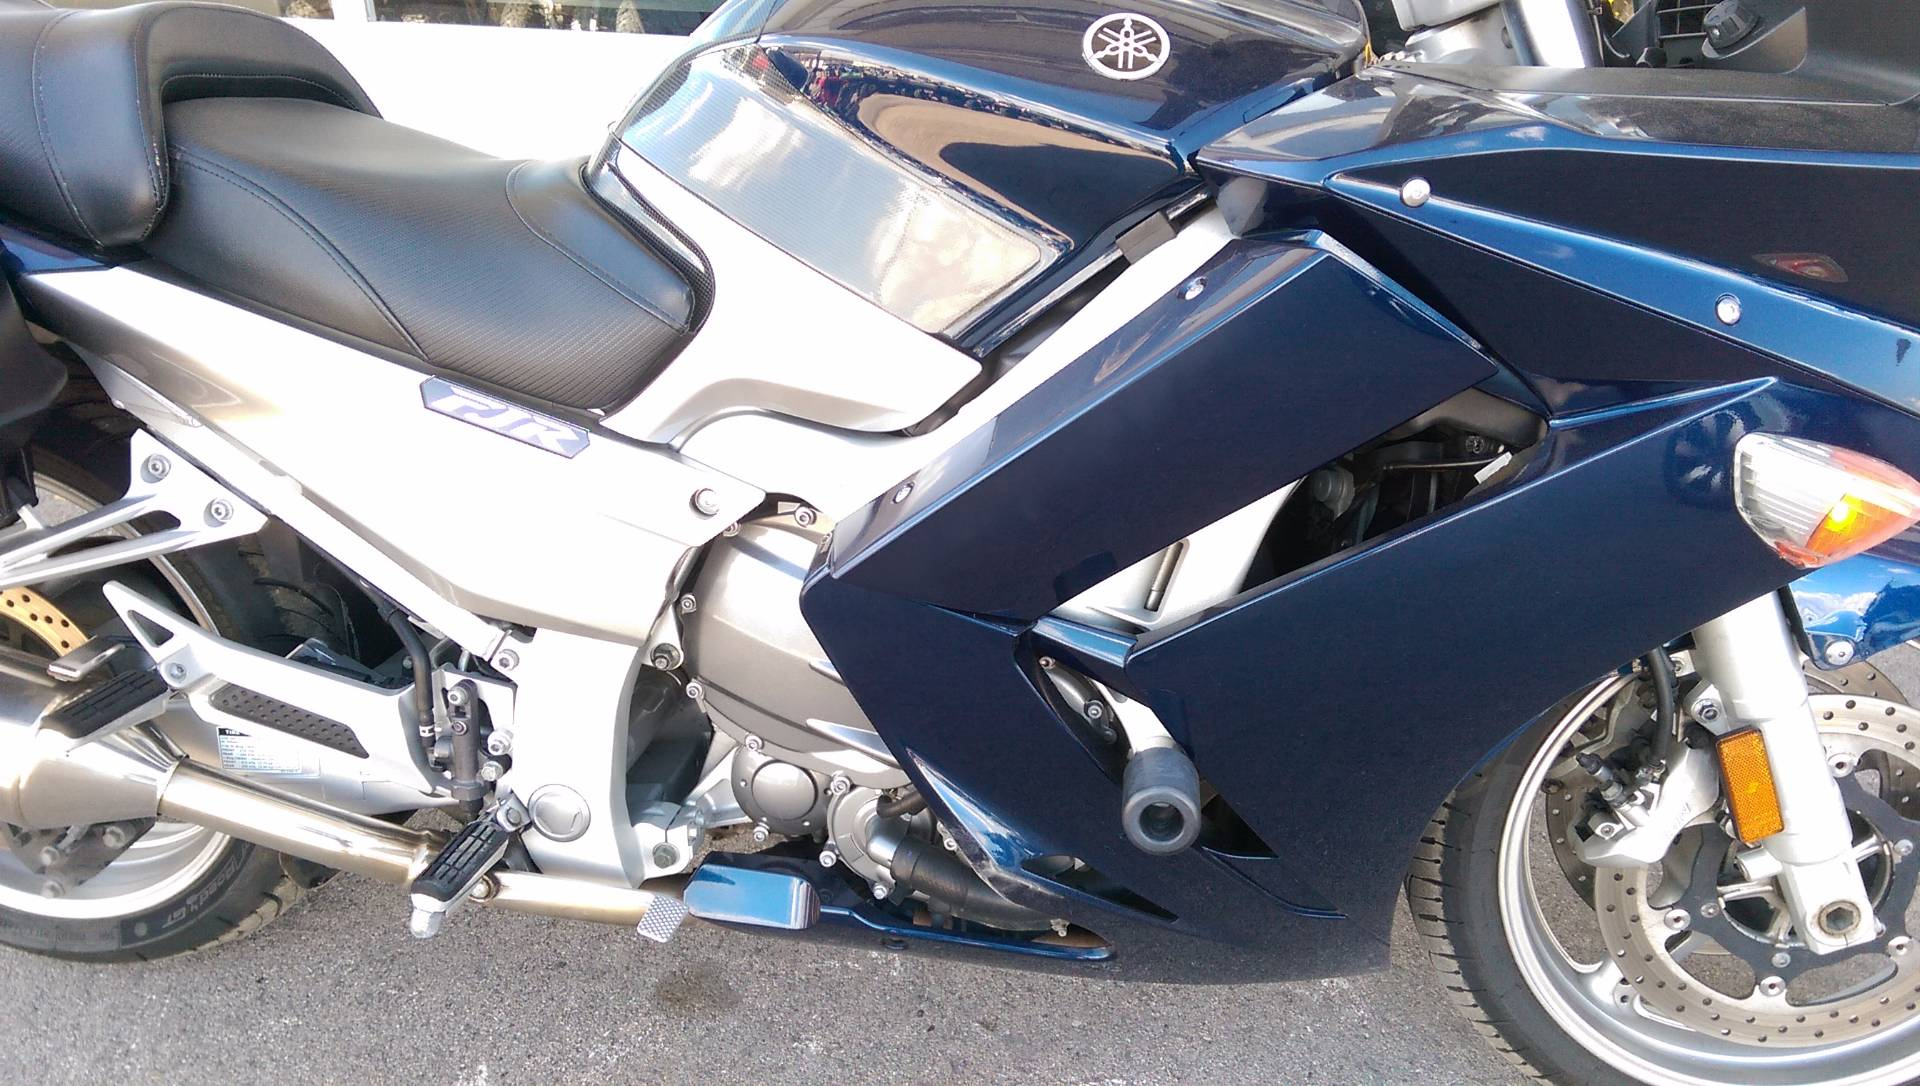 2006 Yamaha FJR 1300A 6